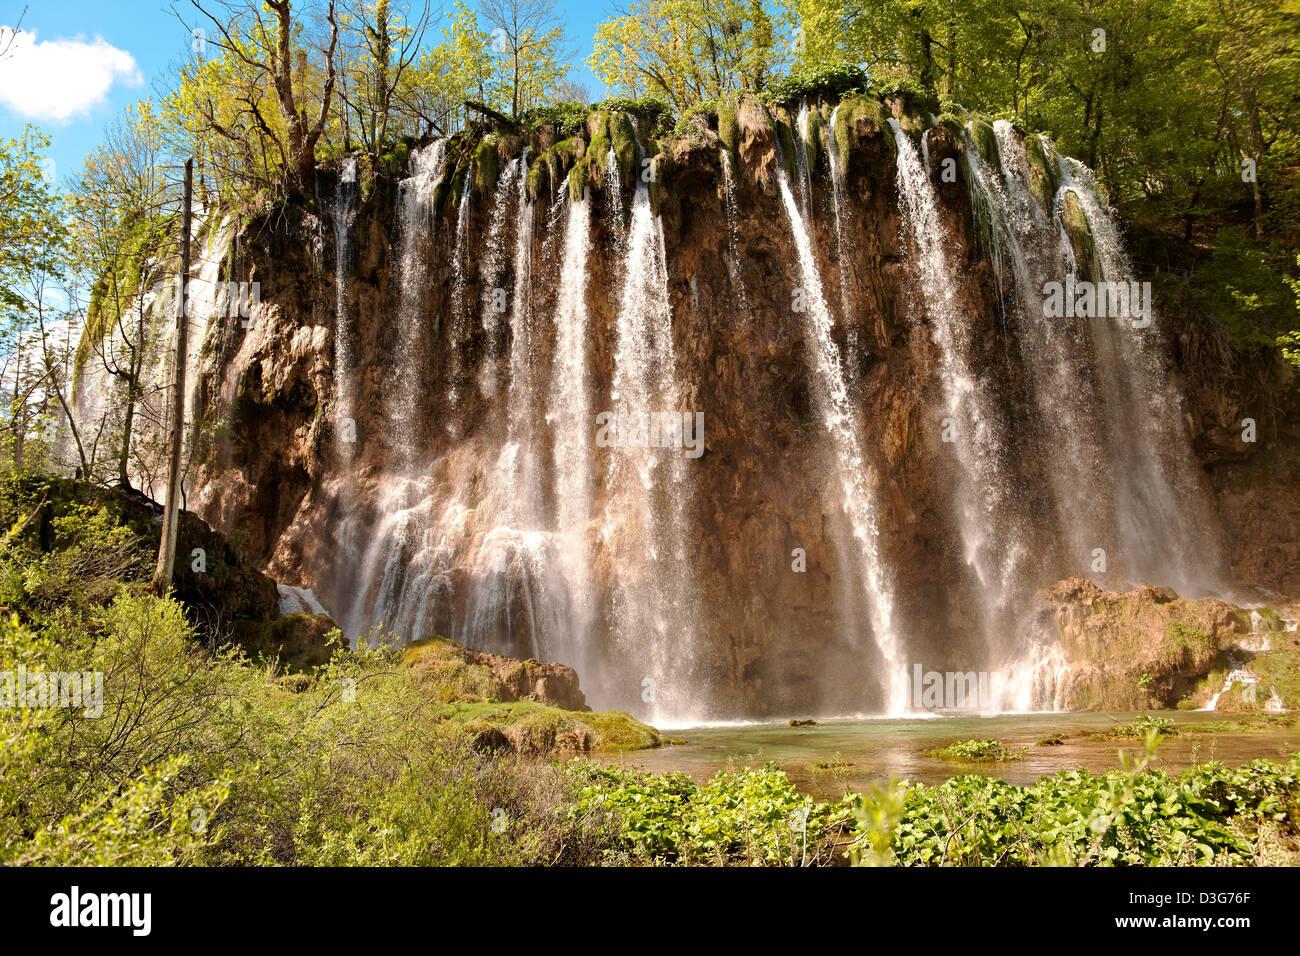 Waterfall in Plitvice Lakes National Park Croatia - Stock Image